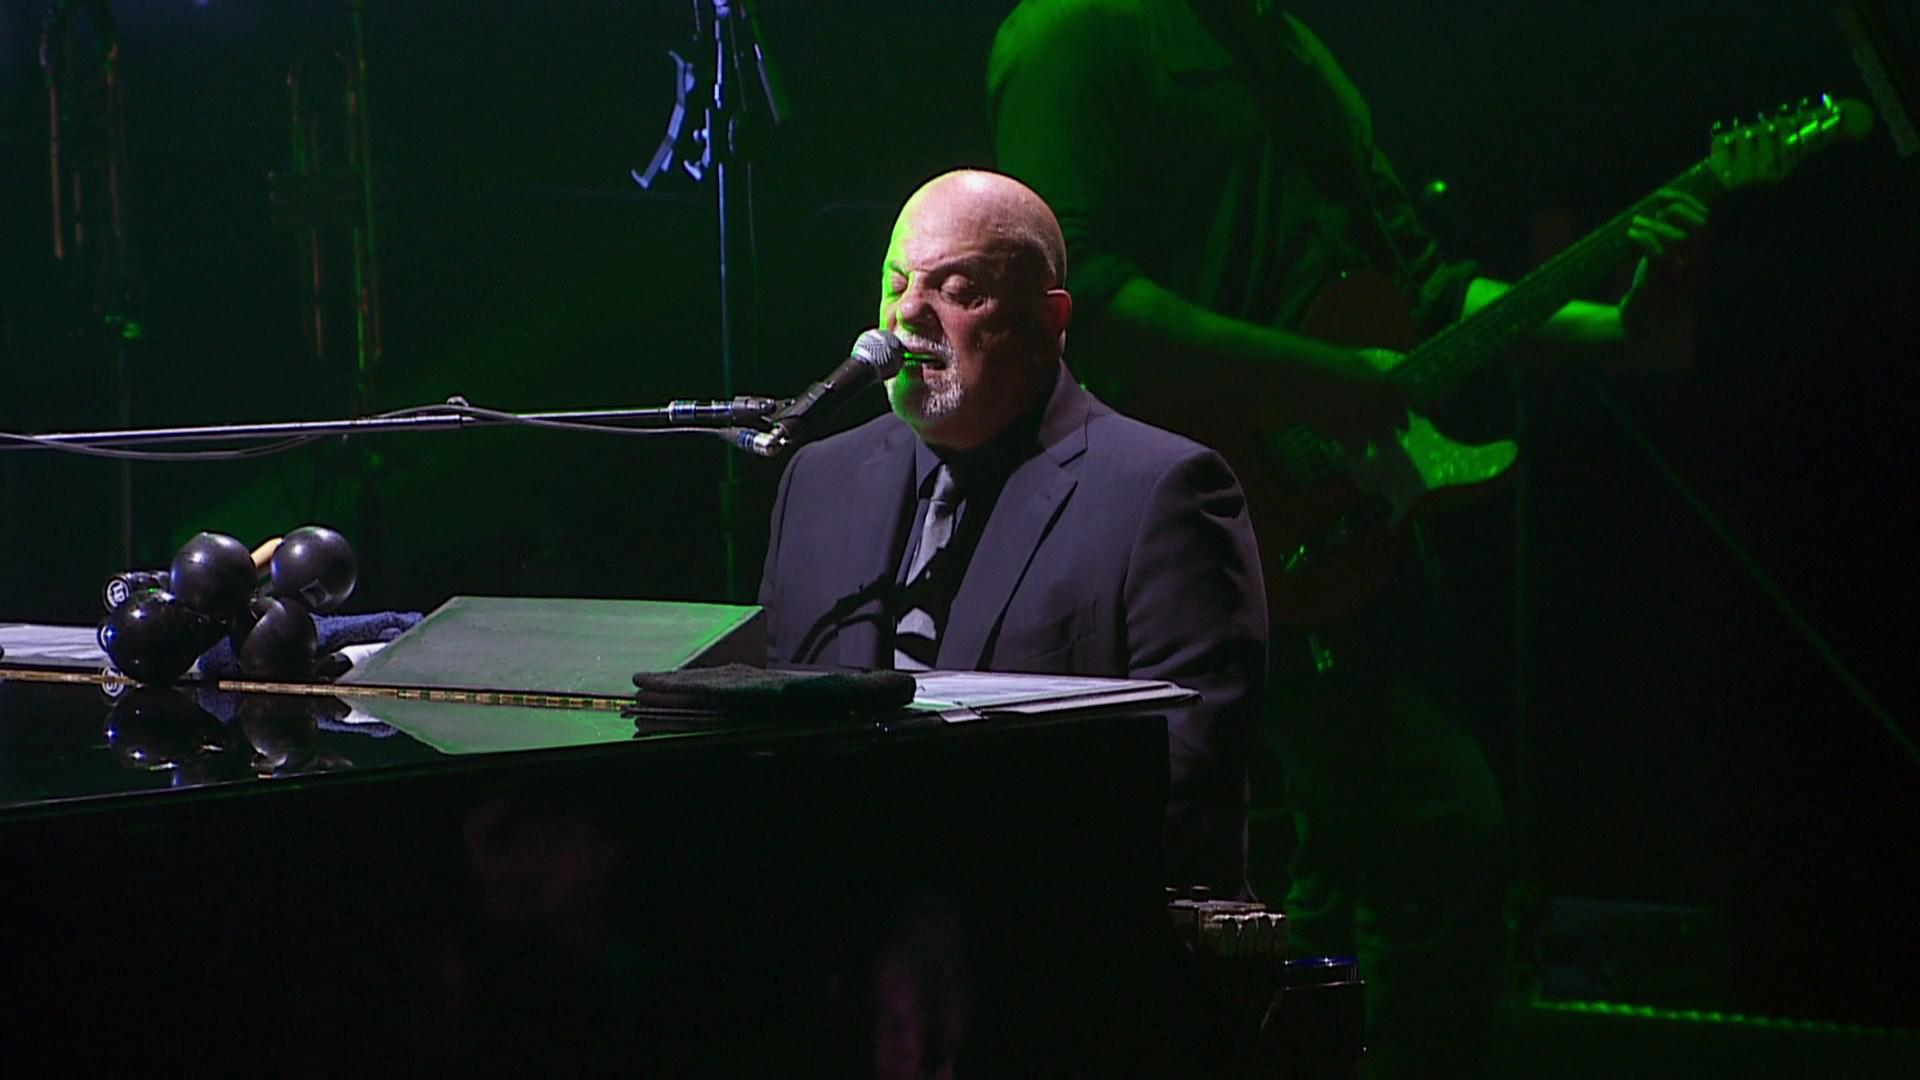 Billy Joel (character)